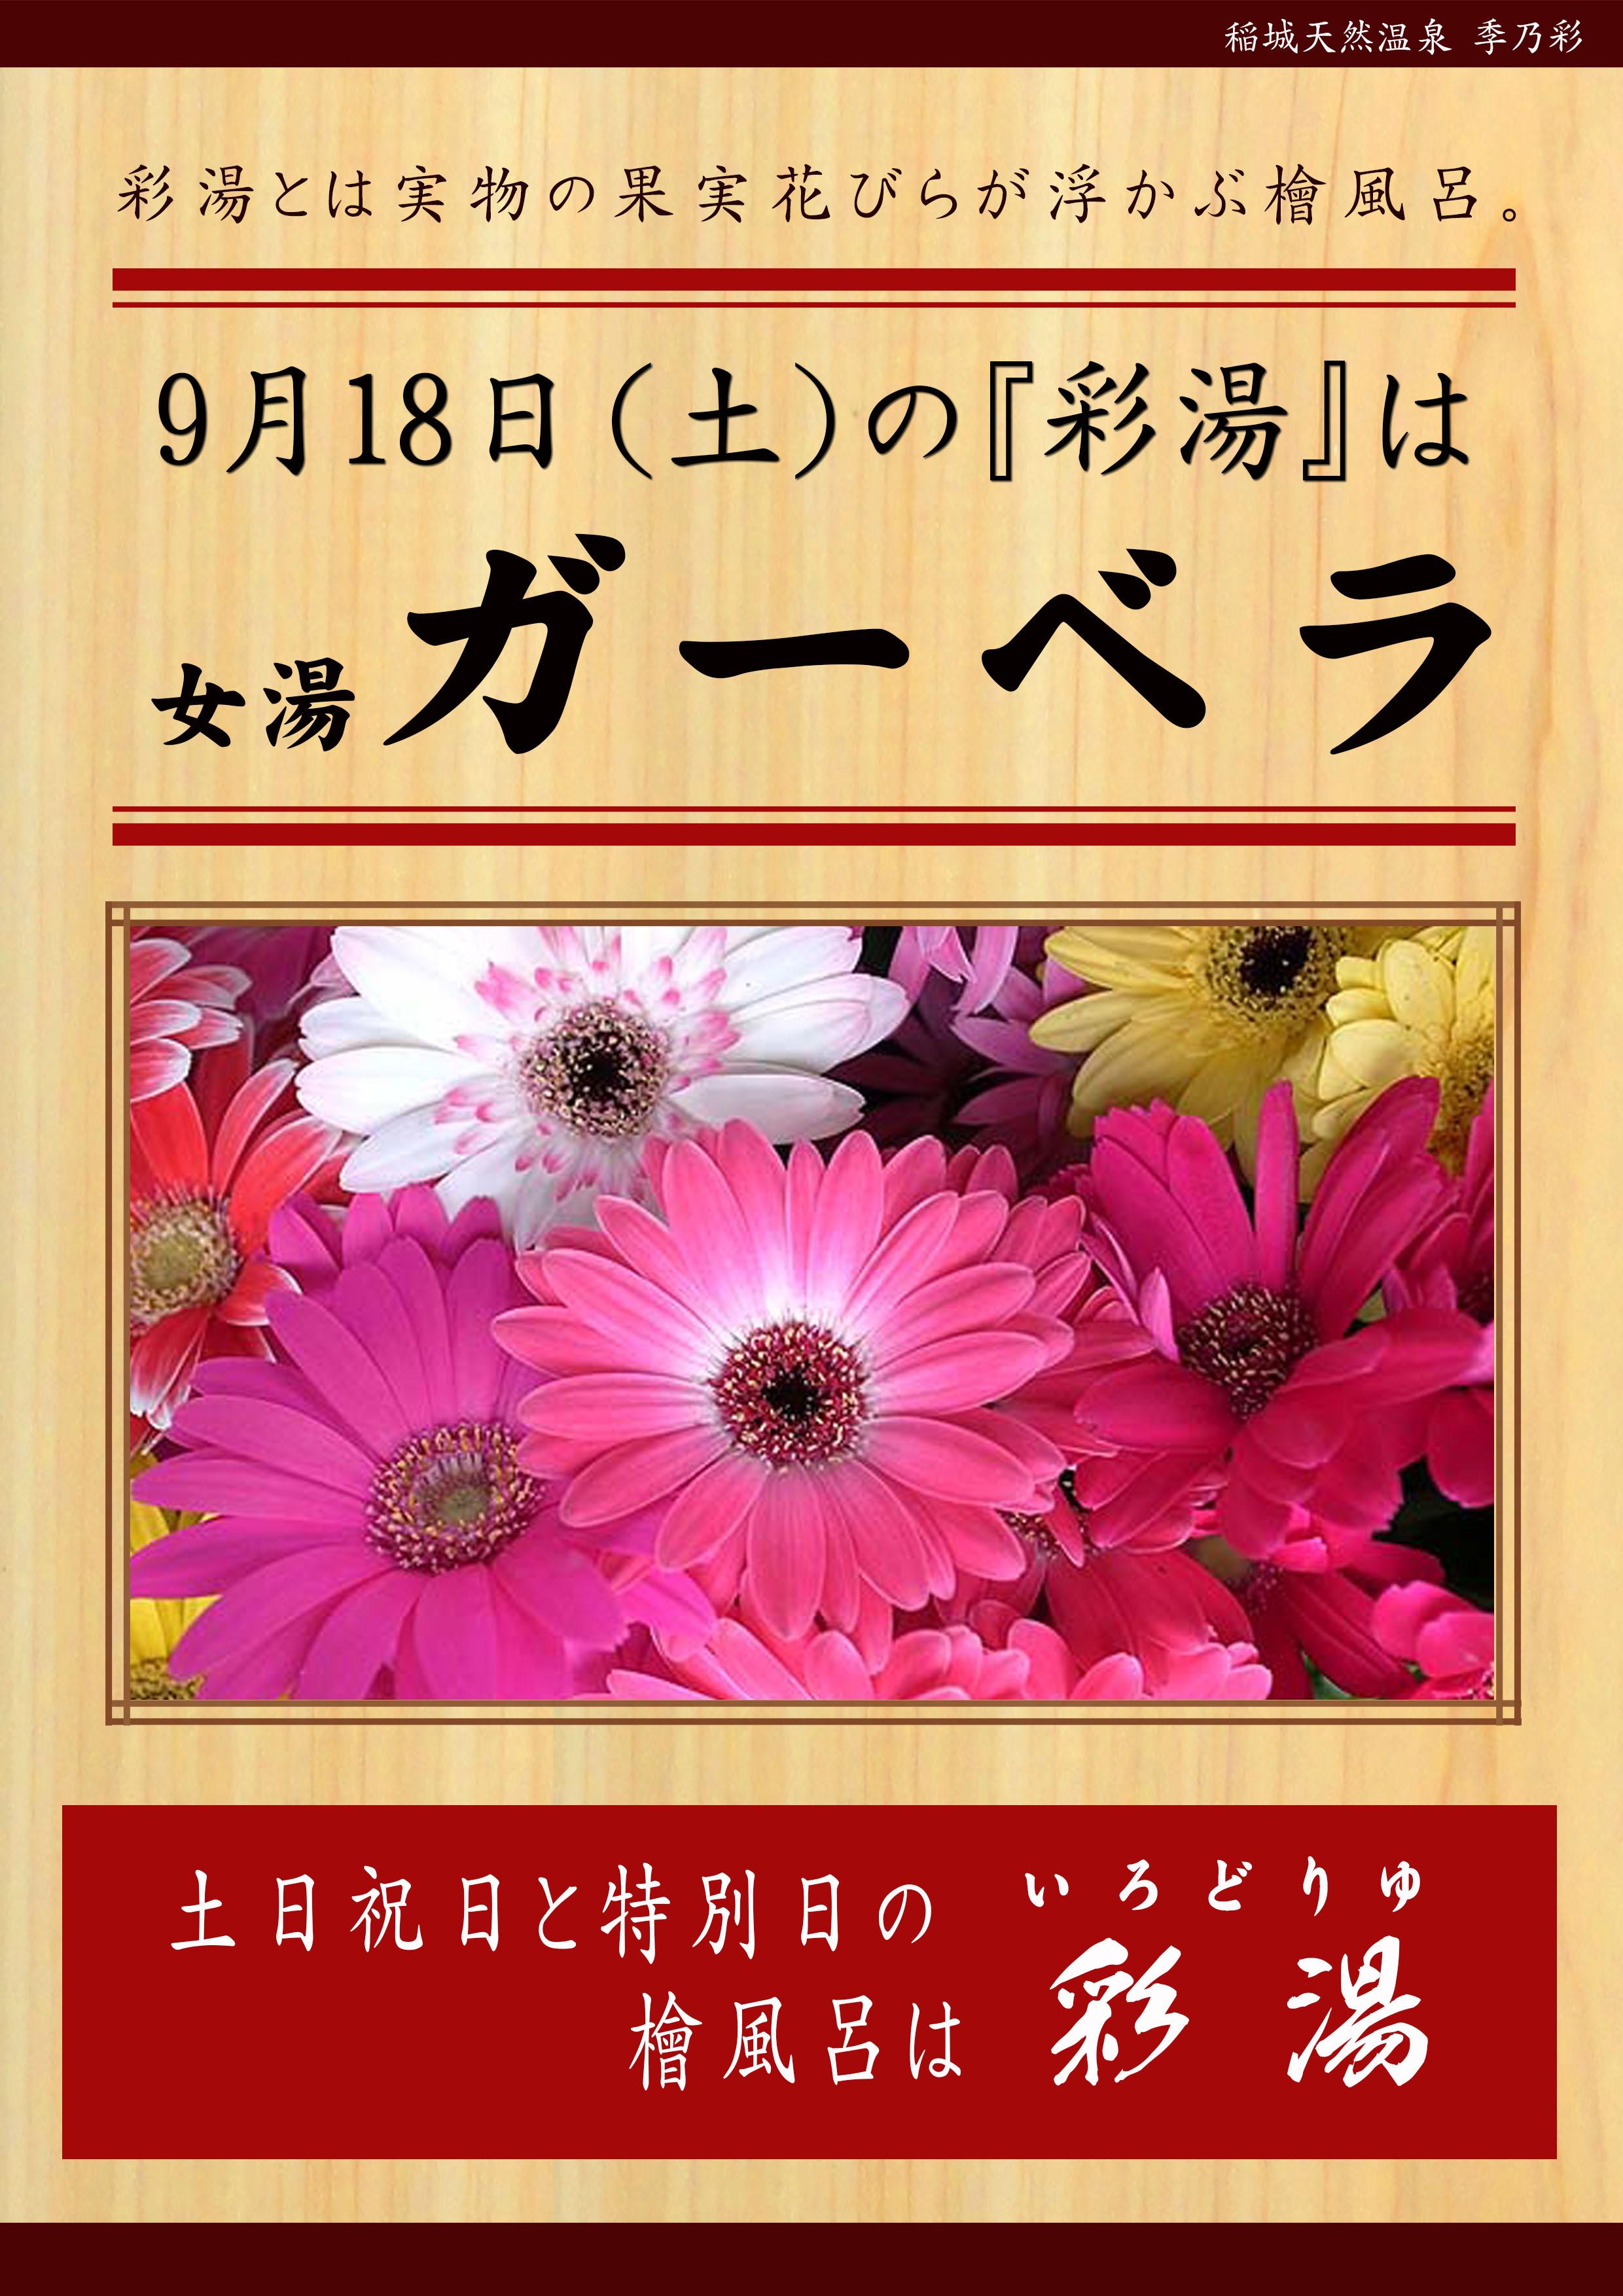 20210918 POP イベント 彩湯 女湯 ガーベラ